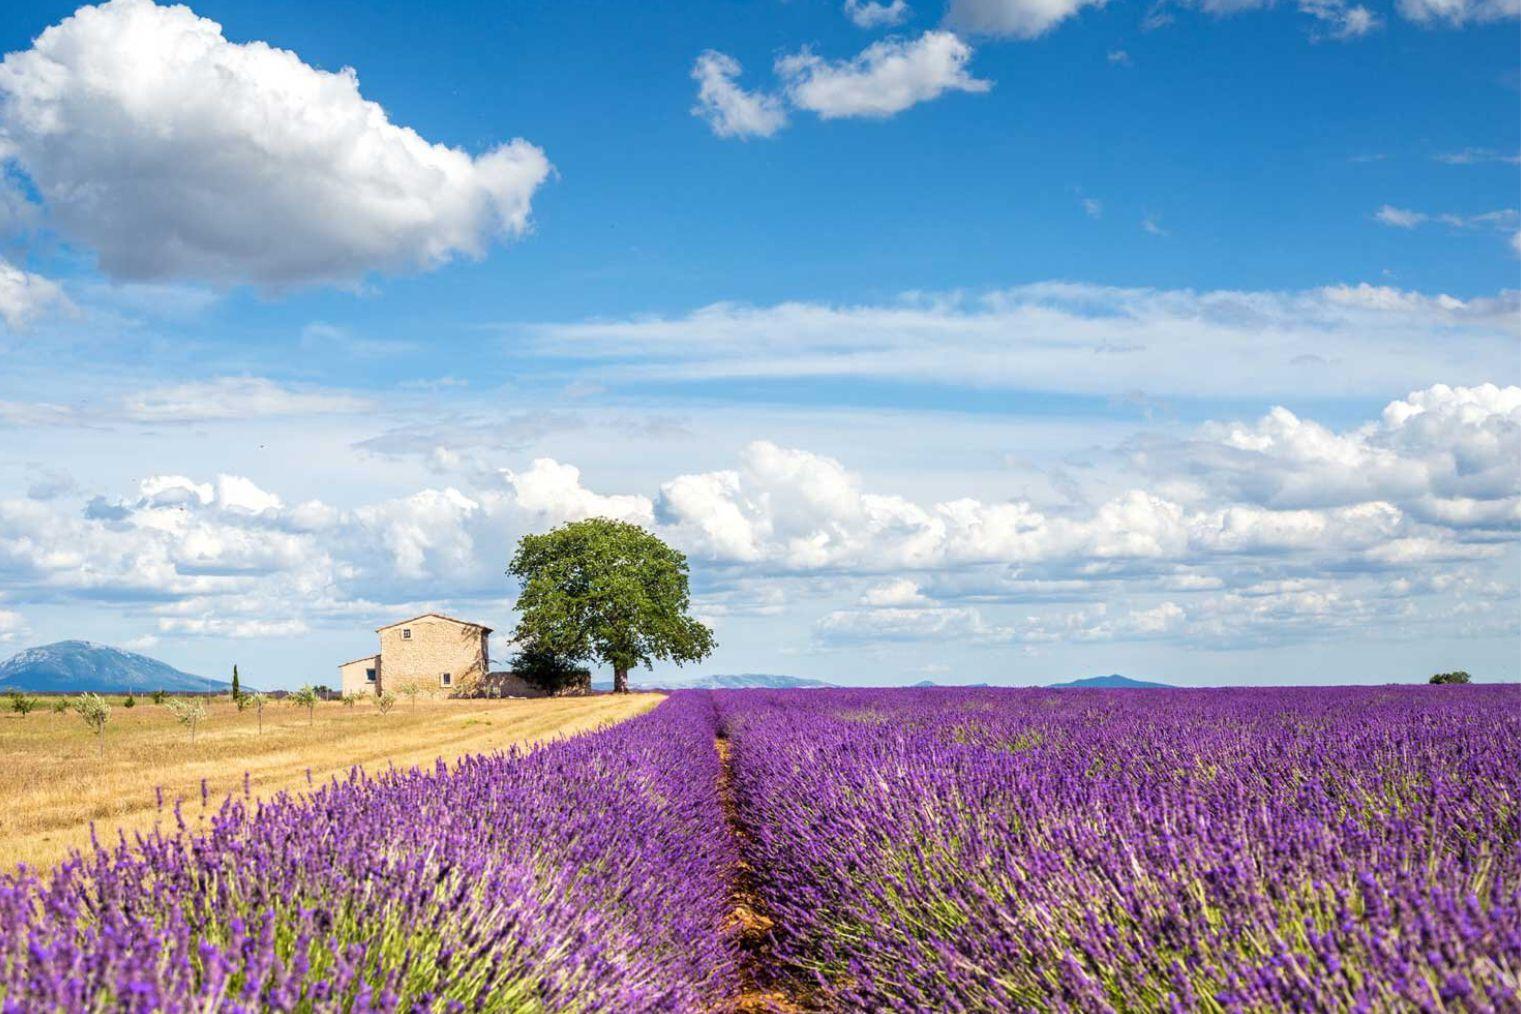 France - Tourist information